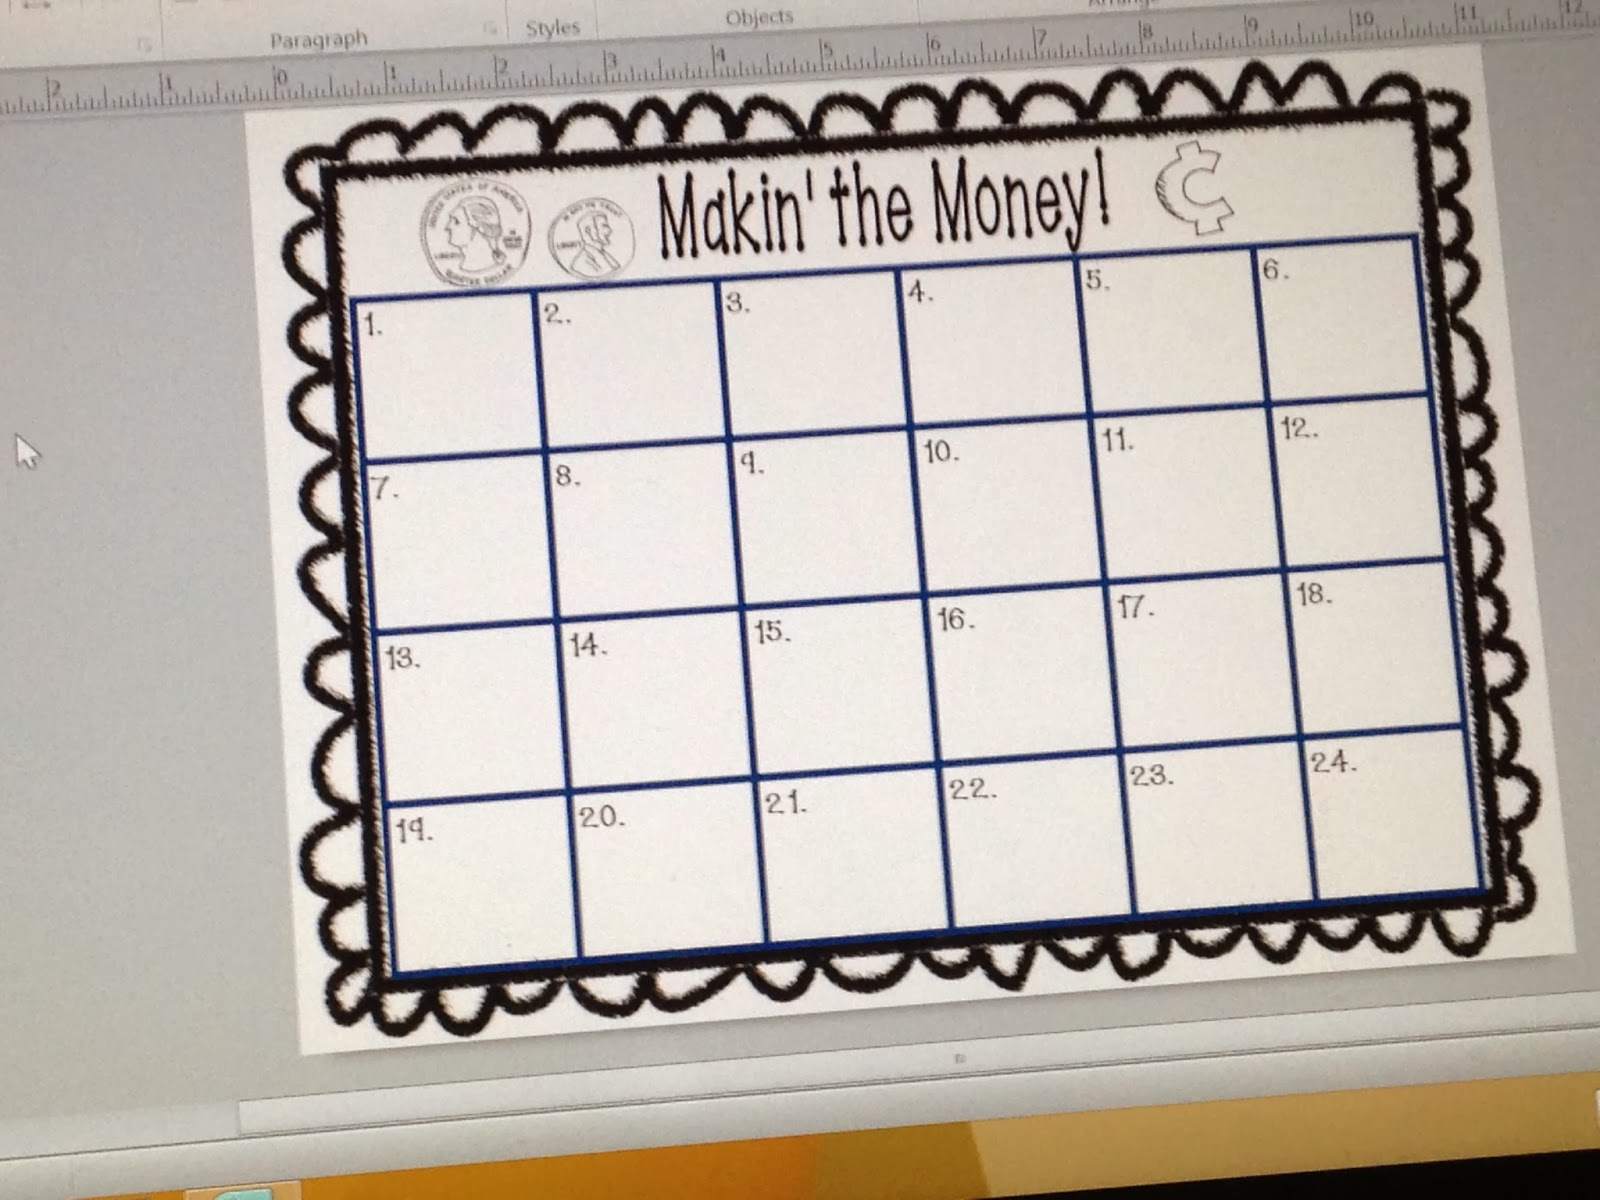 http://www.teacherspayteachers.com/Product/Makin-the-Money-1085302